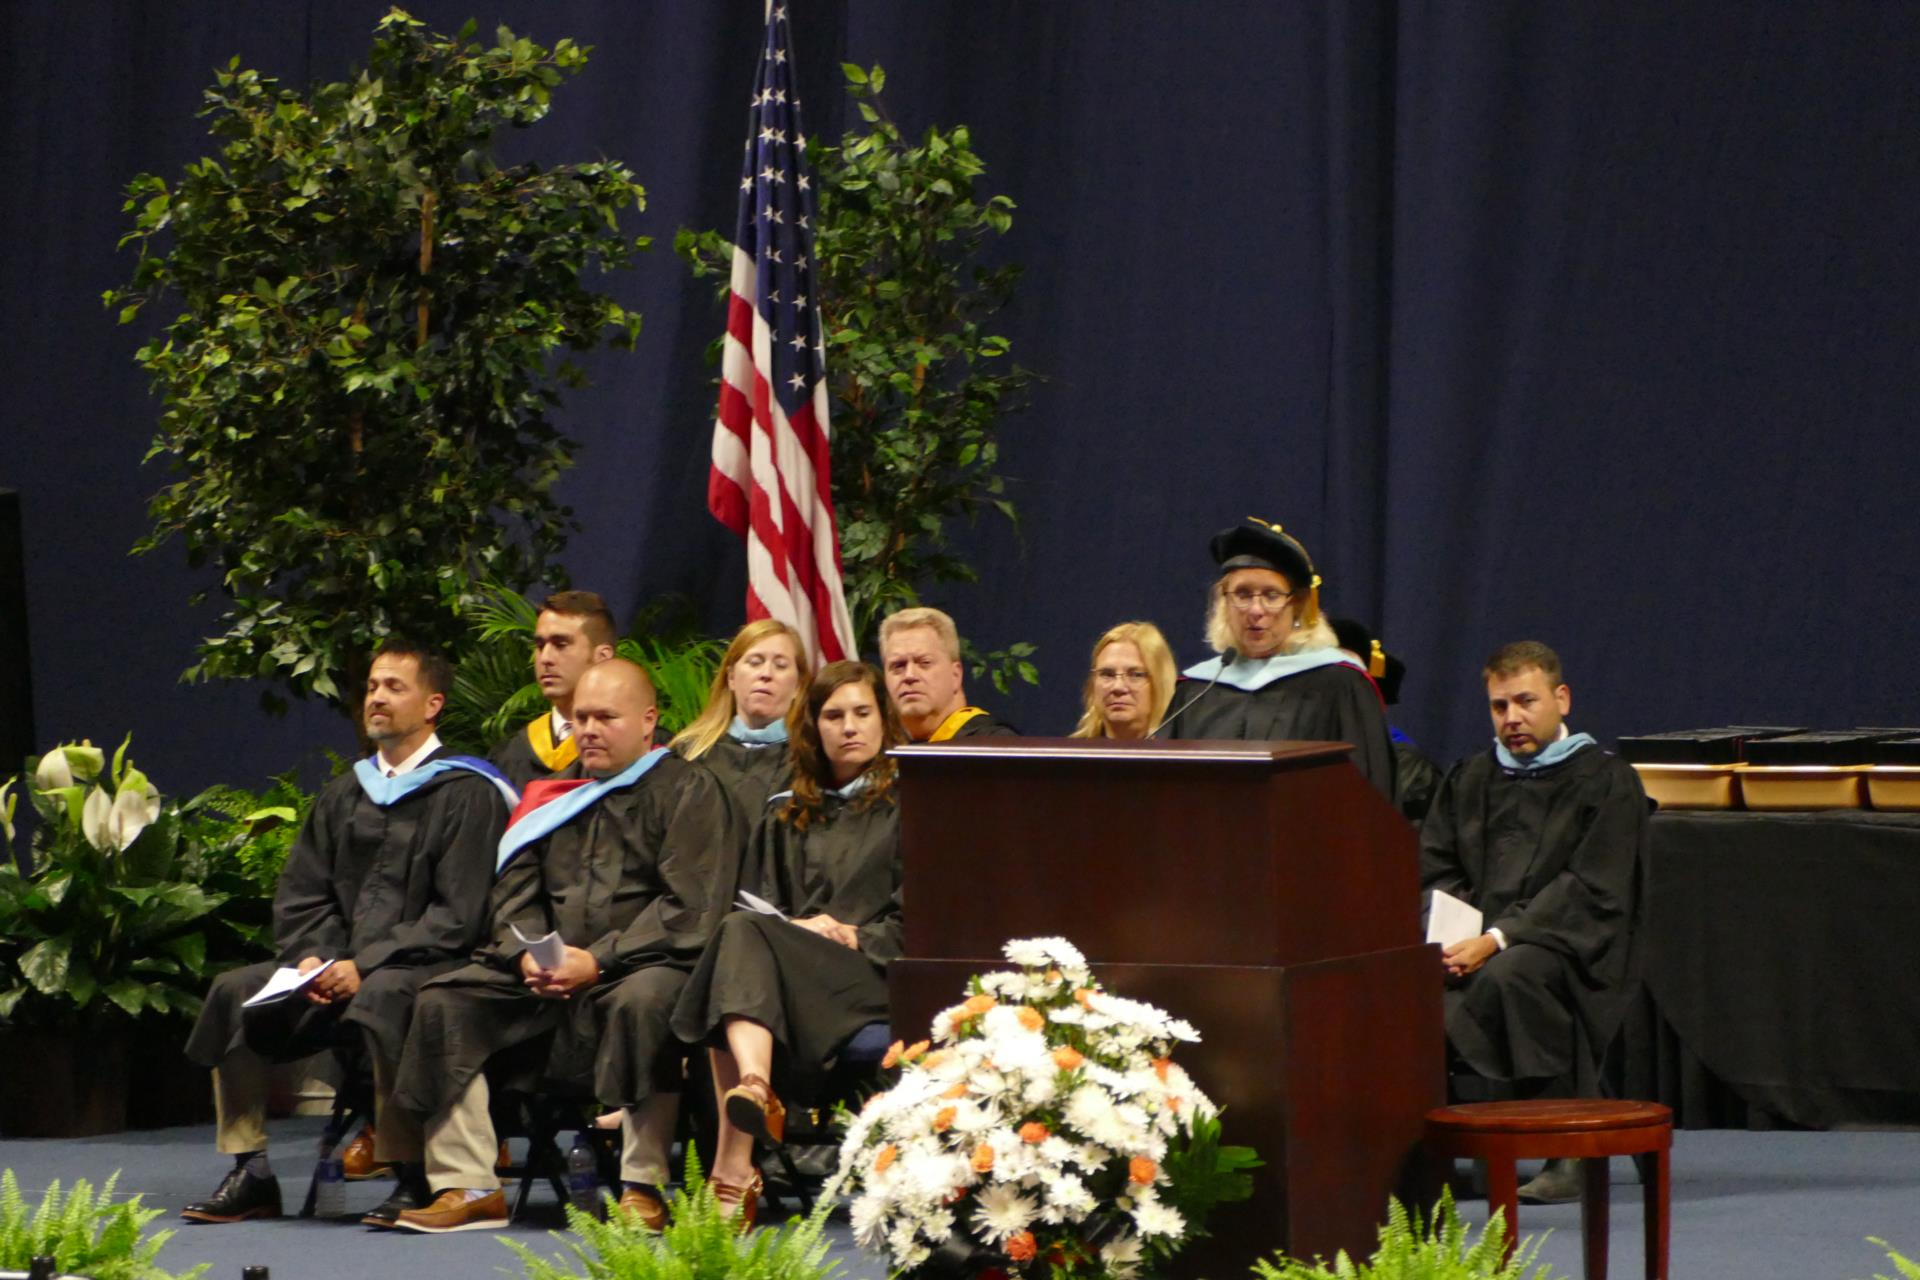 Superintendent delivers graduation speech